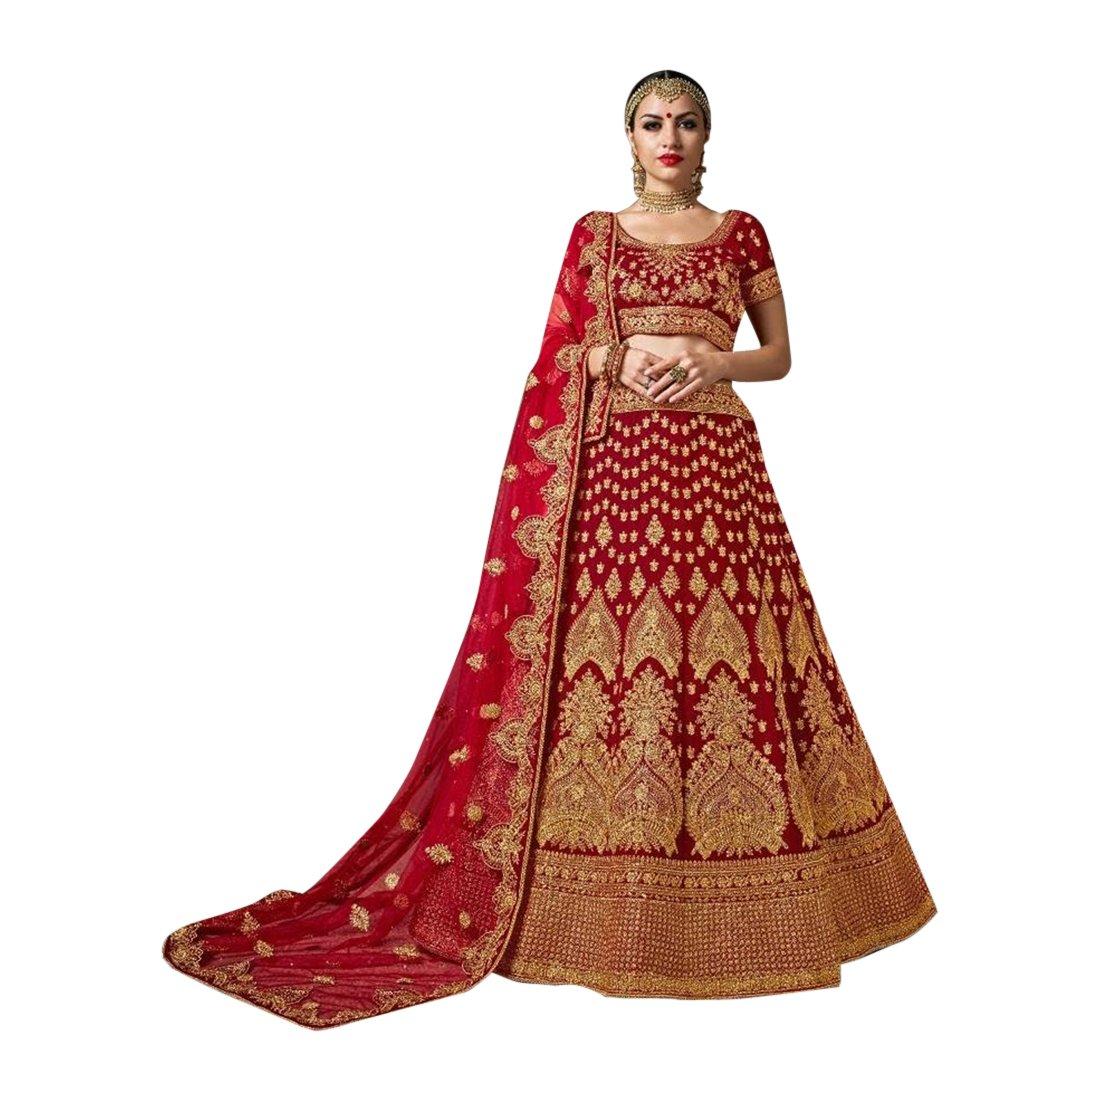 cbca1206e5 Indian Wedding Dresses Amazon